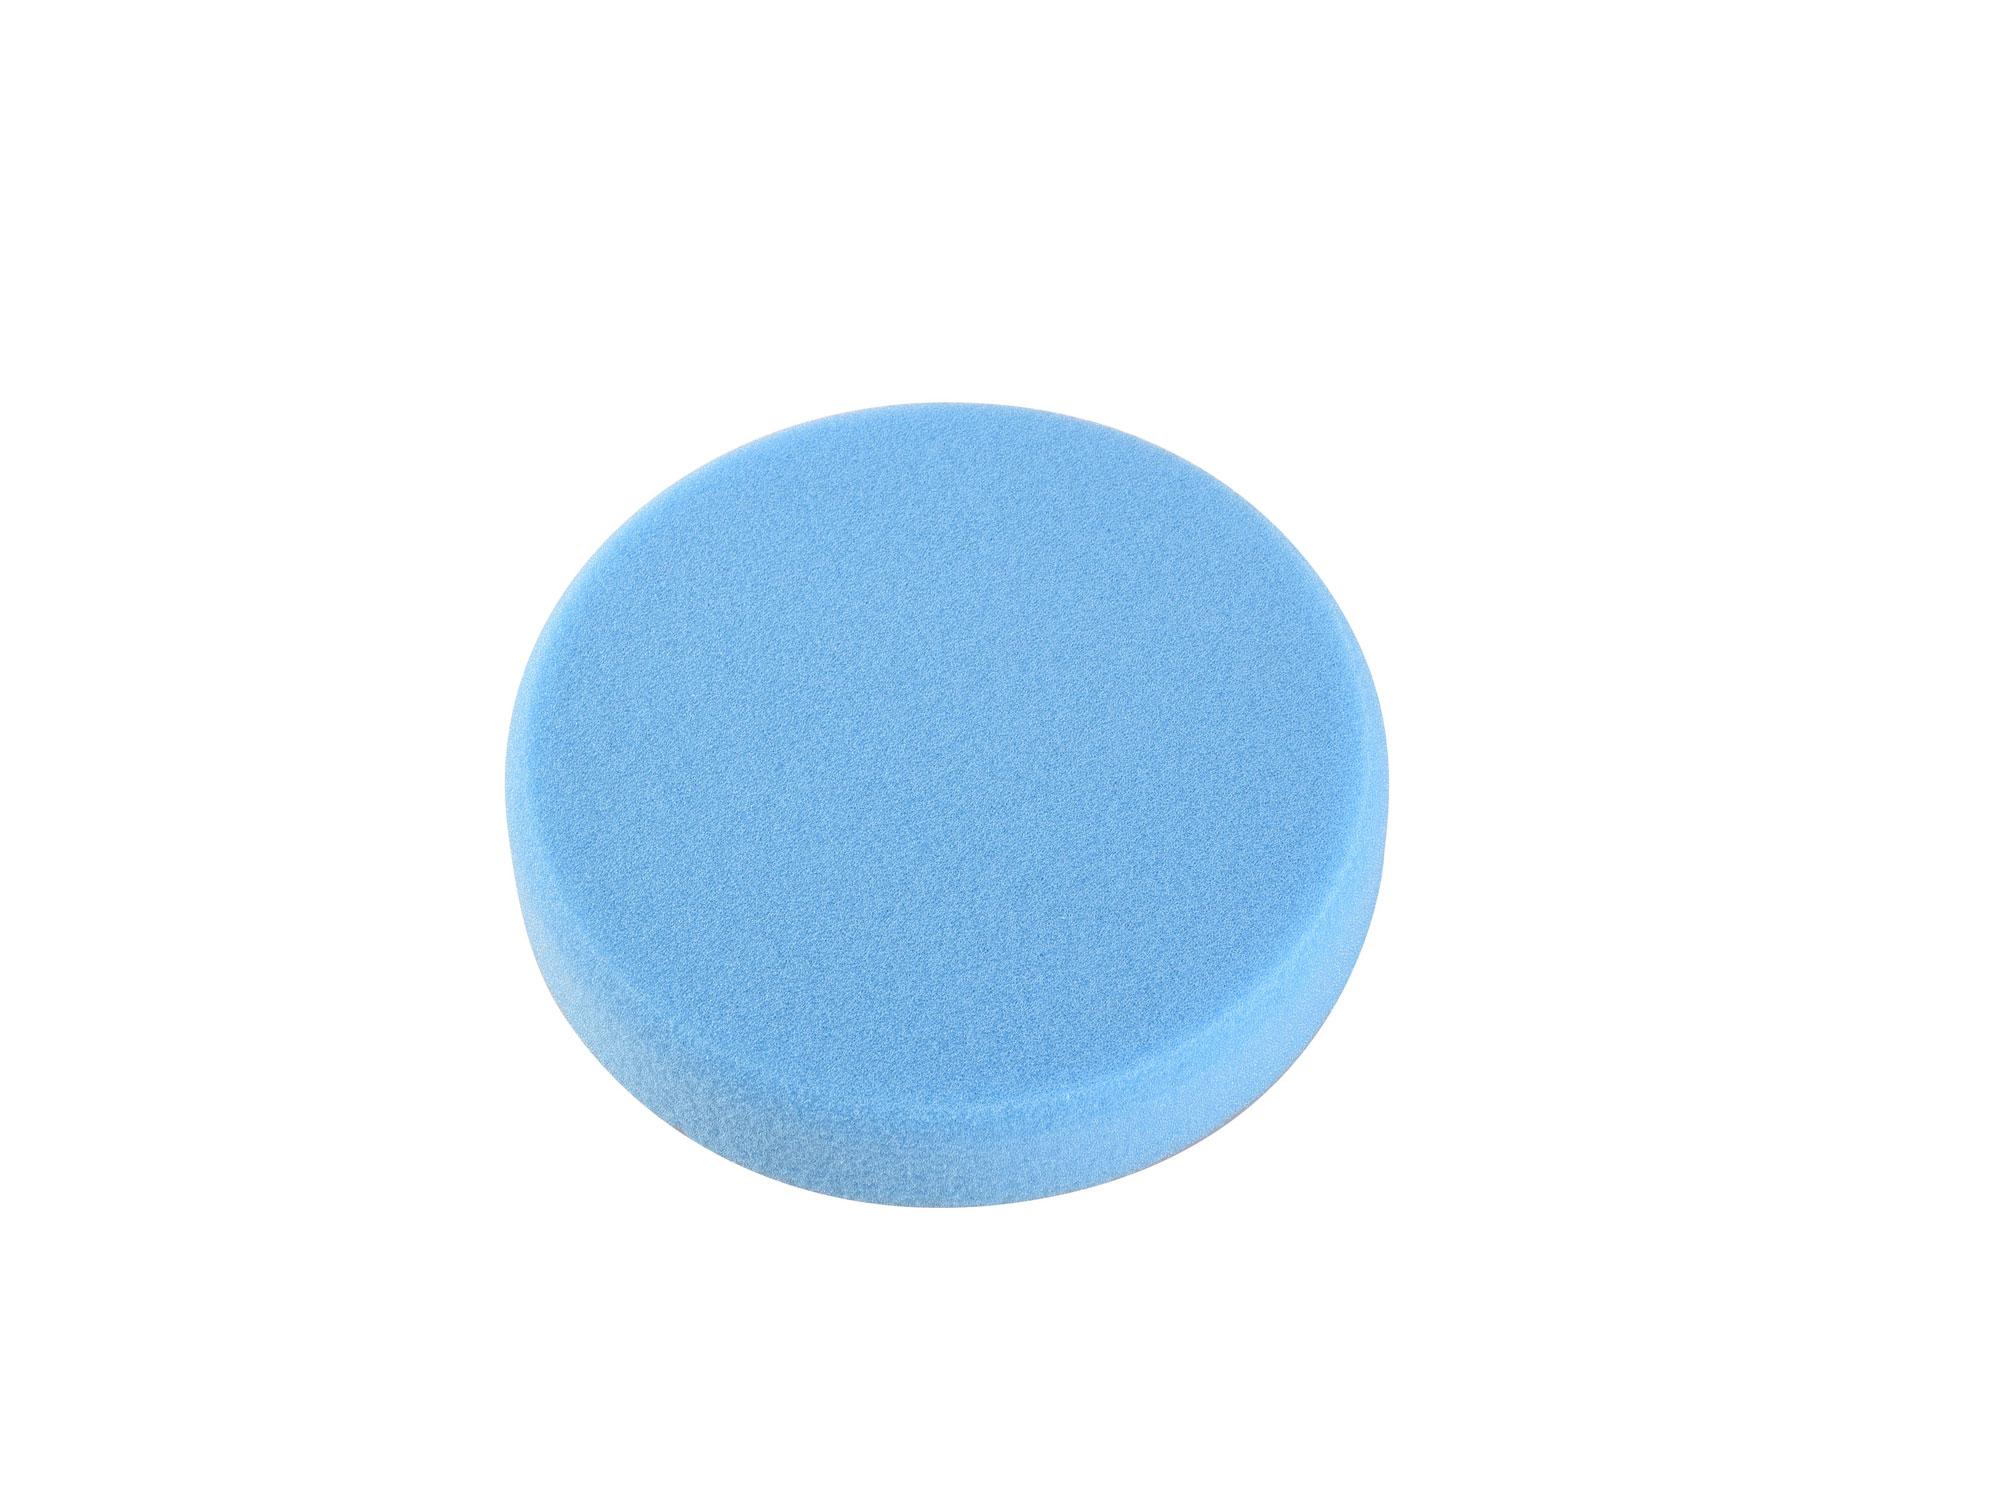 Kotouč leštící penový, T60, modrý, R150x30mm, suchý zip EXTOL PREMIUM 8803546